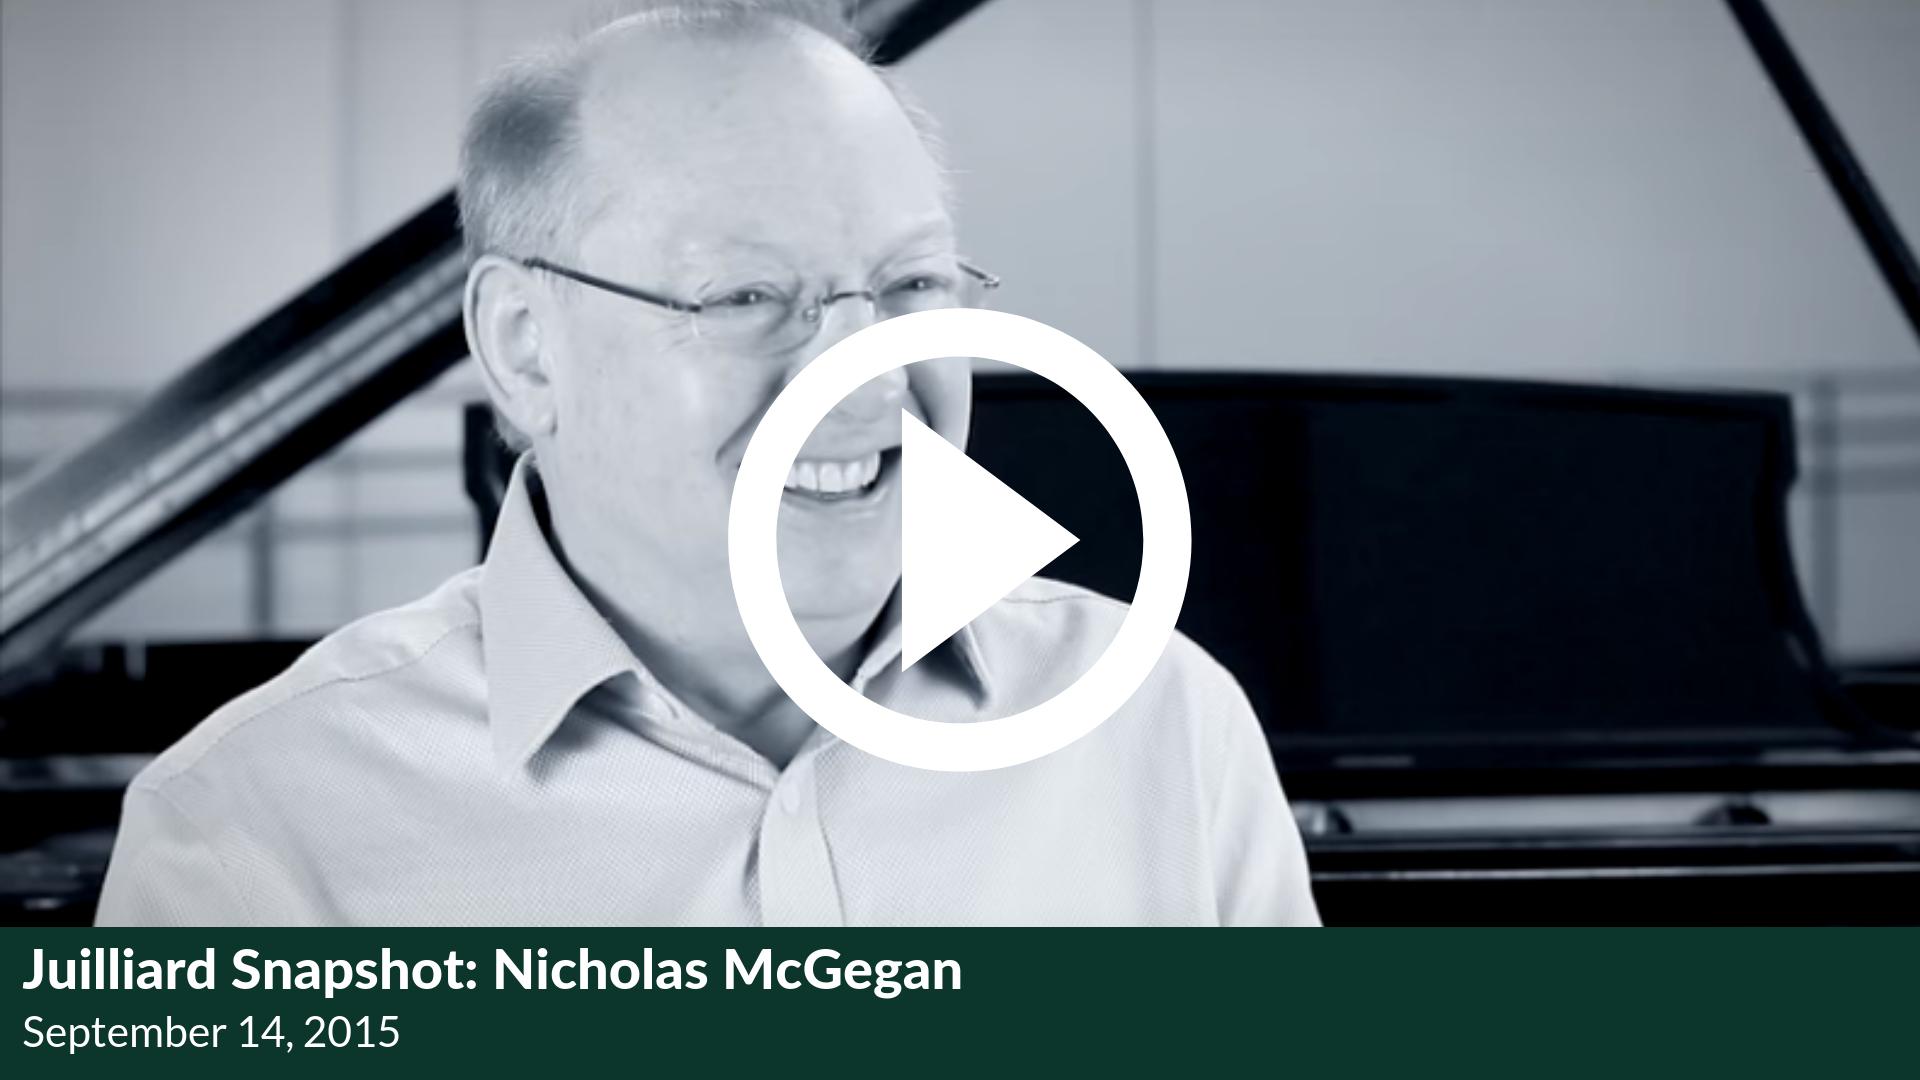 Juilliard Snapshot: Nicholas McGegan